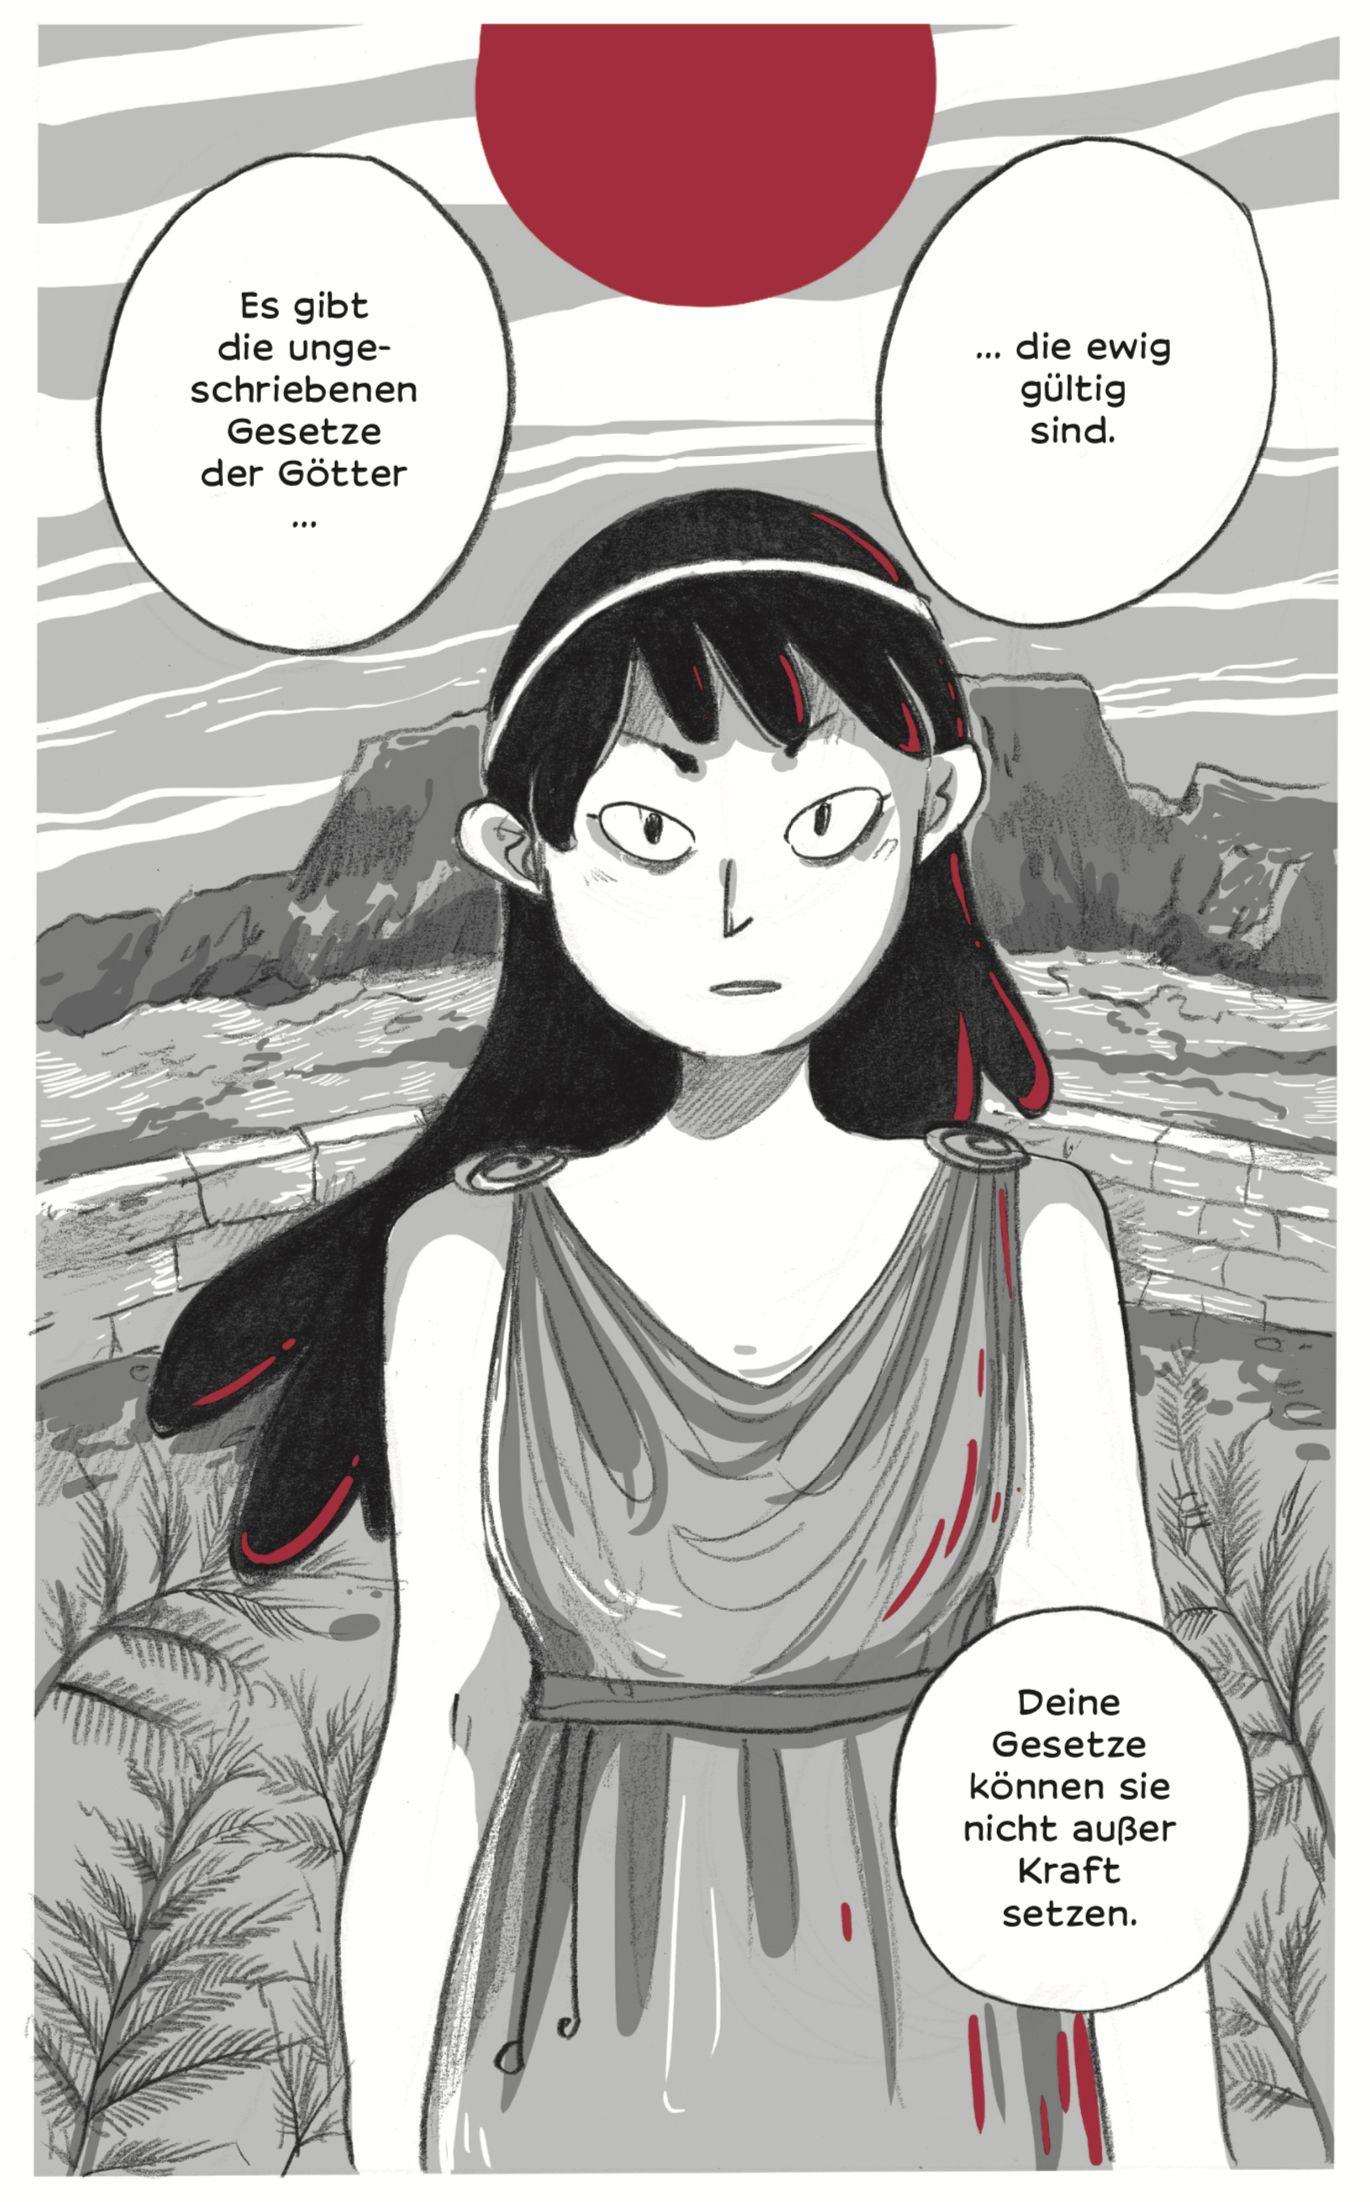 EINMALIGE VERWENDUNG Kultur/ Comics/ Antigone